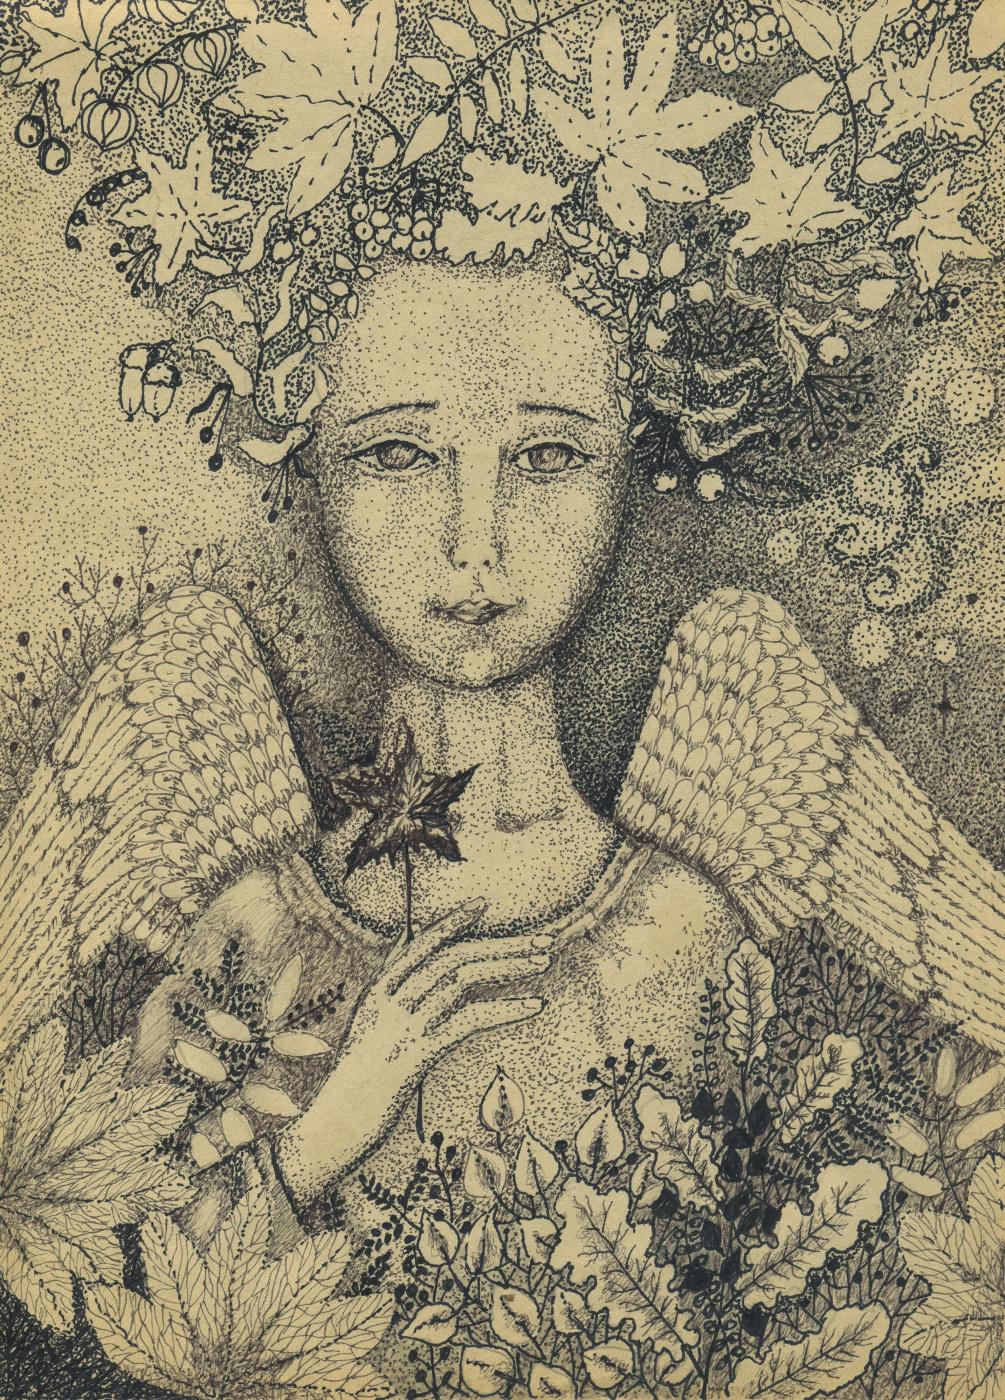 Olyona Ivanovna Koneva. Autumn angel